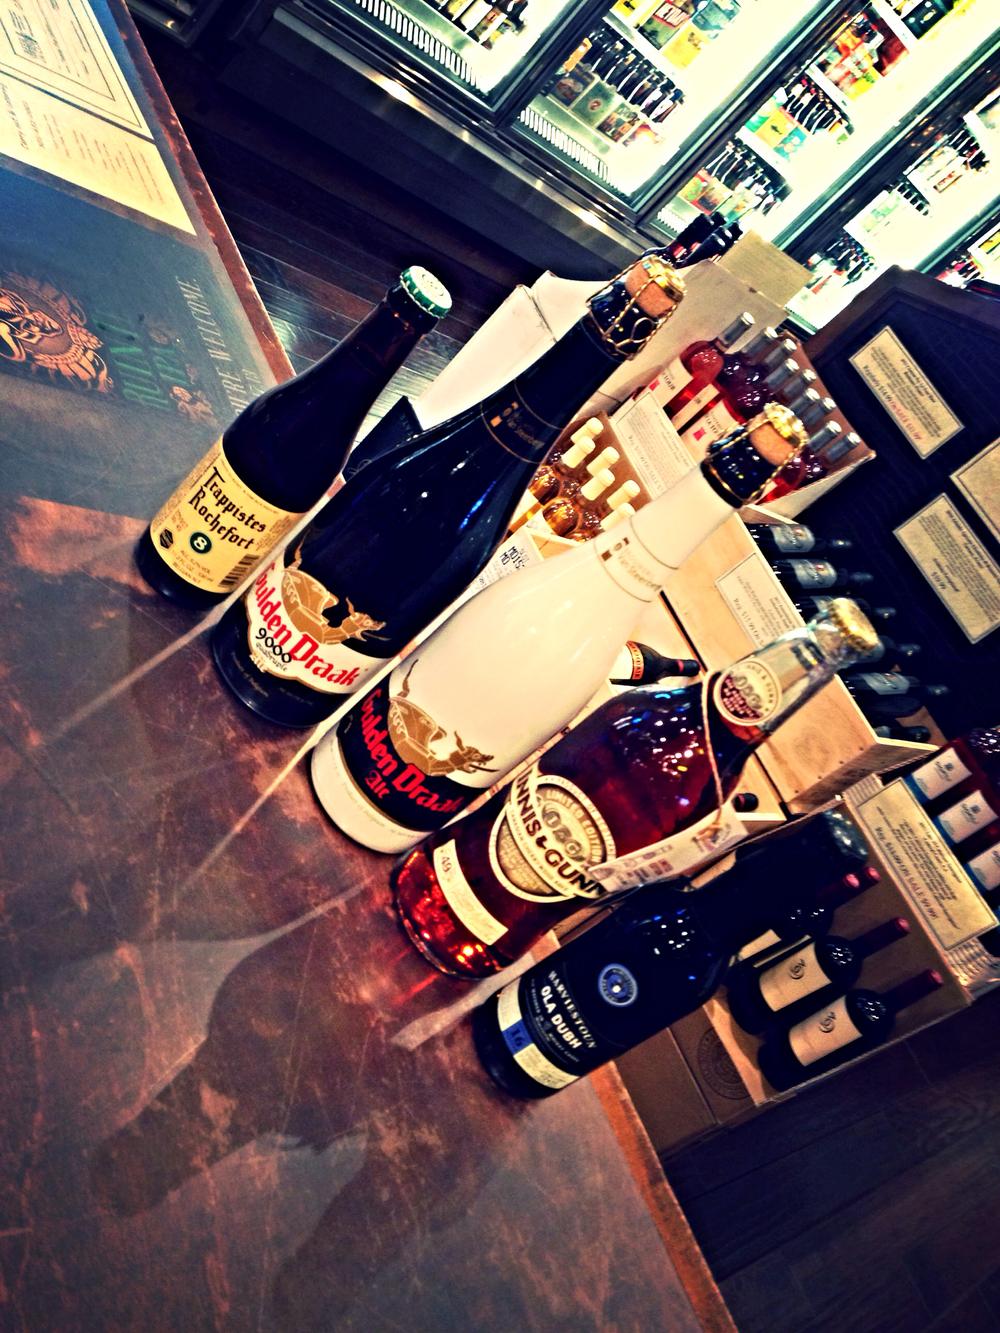 Rochefort 8, Gulden Draak, Gulden Draak 9000 Quad, Innis & Gunn Cherrywood Aged w/ Maple Syrup, and Harviestouns Ola Dubh 16 Year